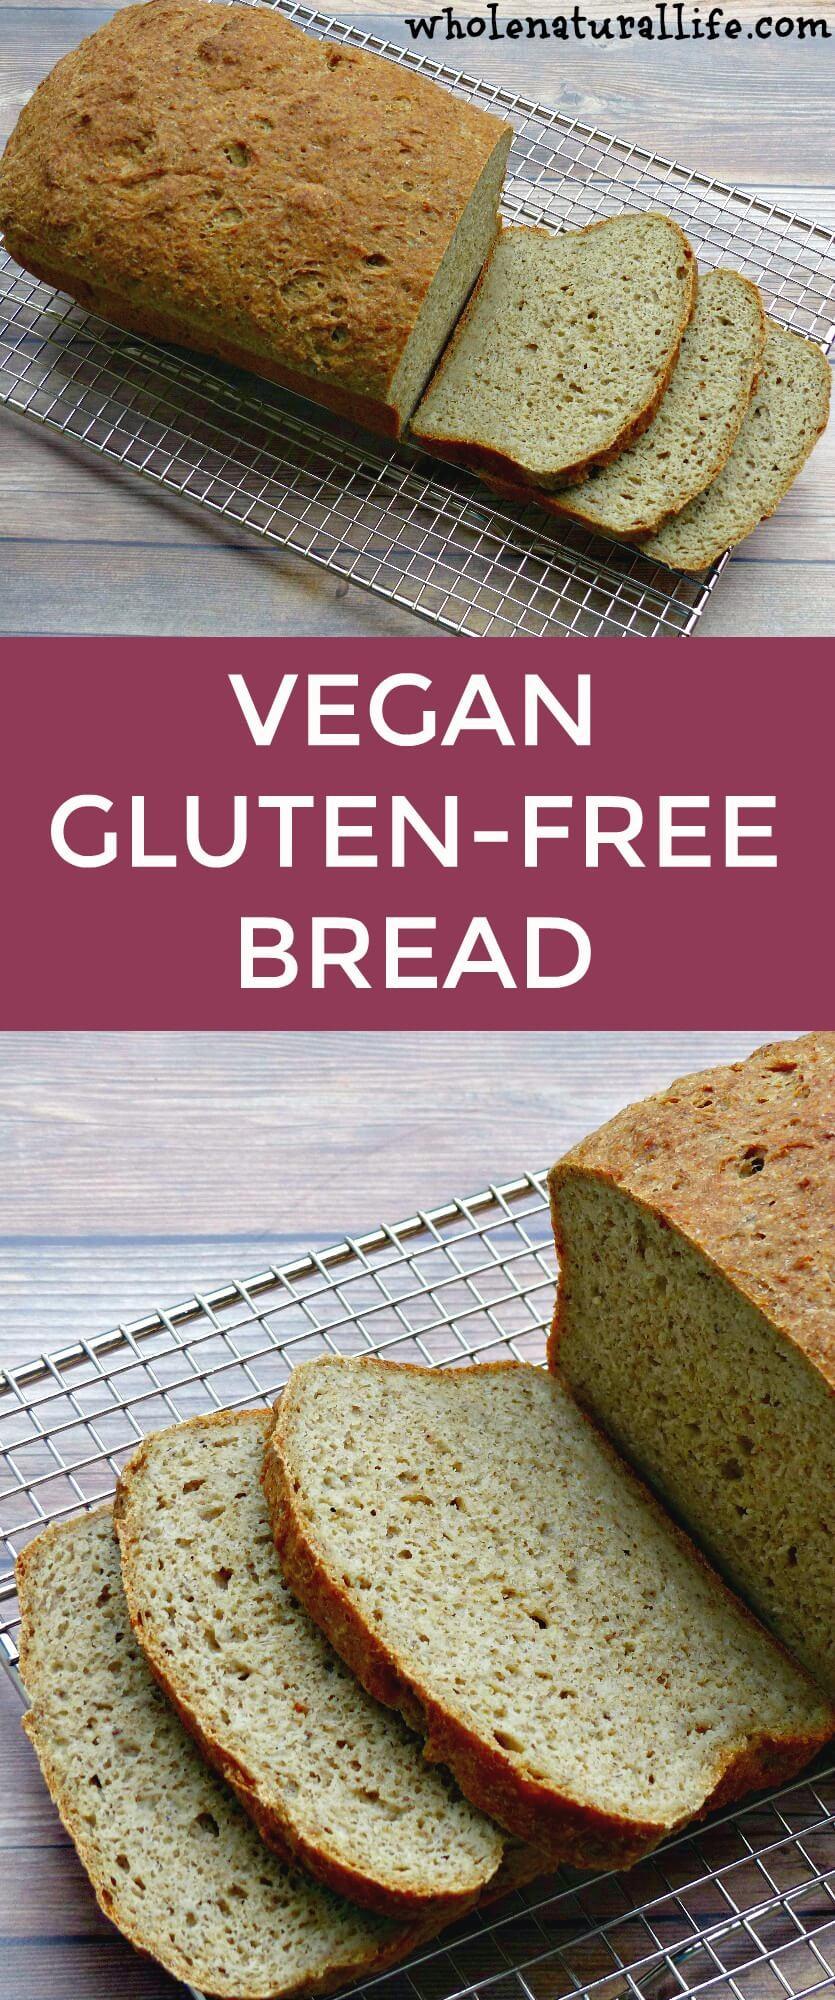 Gluten Free Vegan Bread Recipe  Vegan Gluten free Bread Whole Natural Life